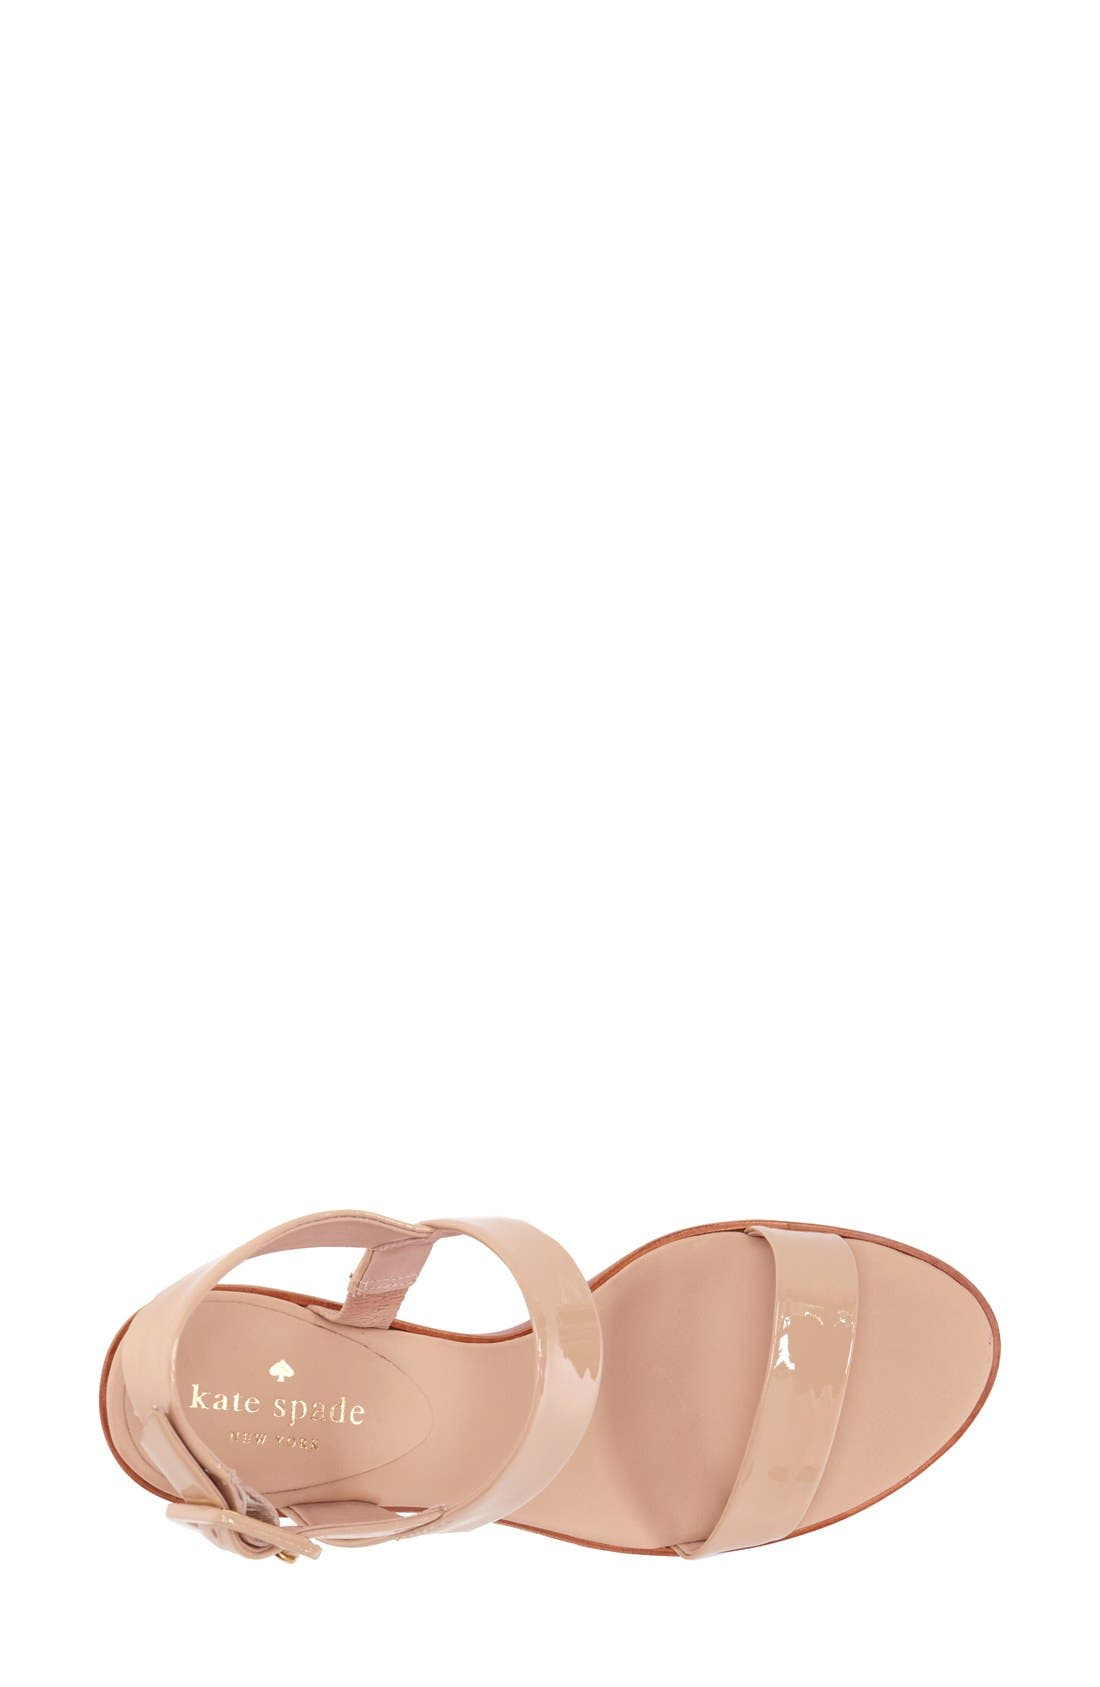 Alternate Image 3  - kate spade new york 'nice' sandal (Women)